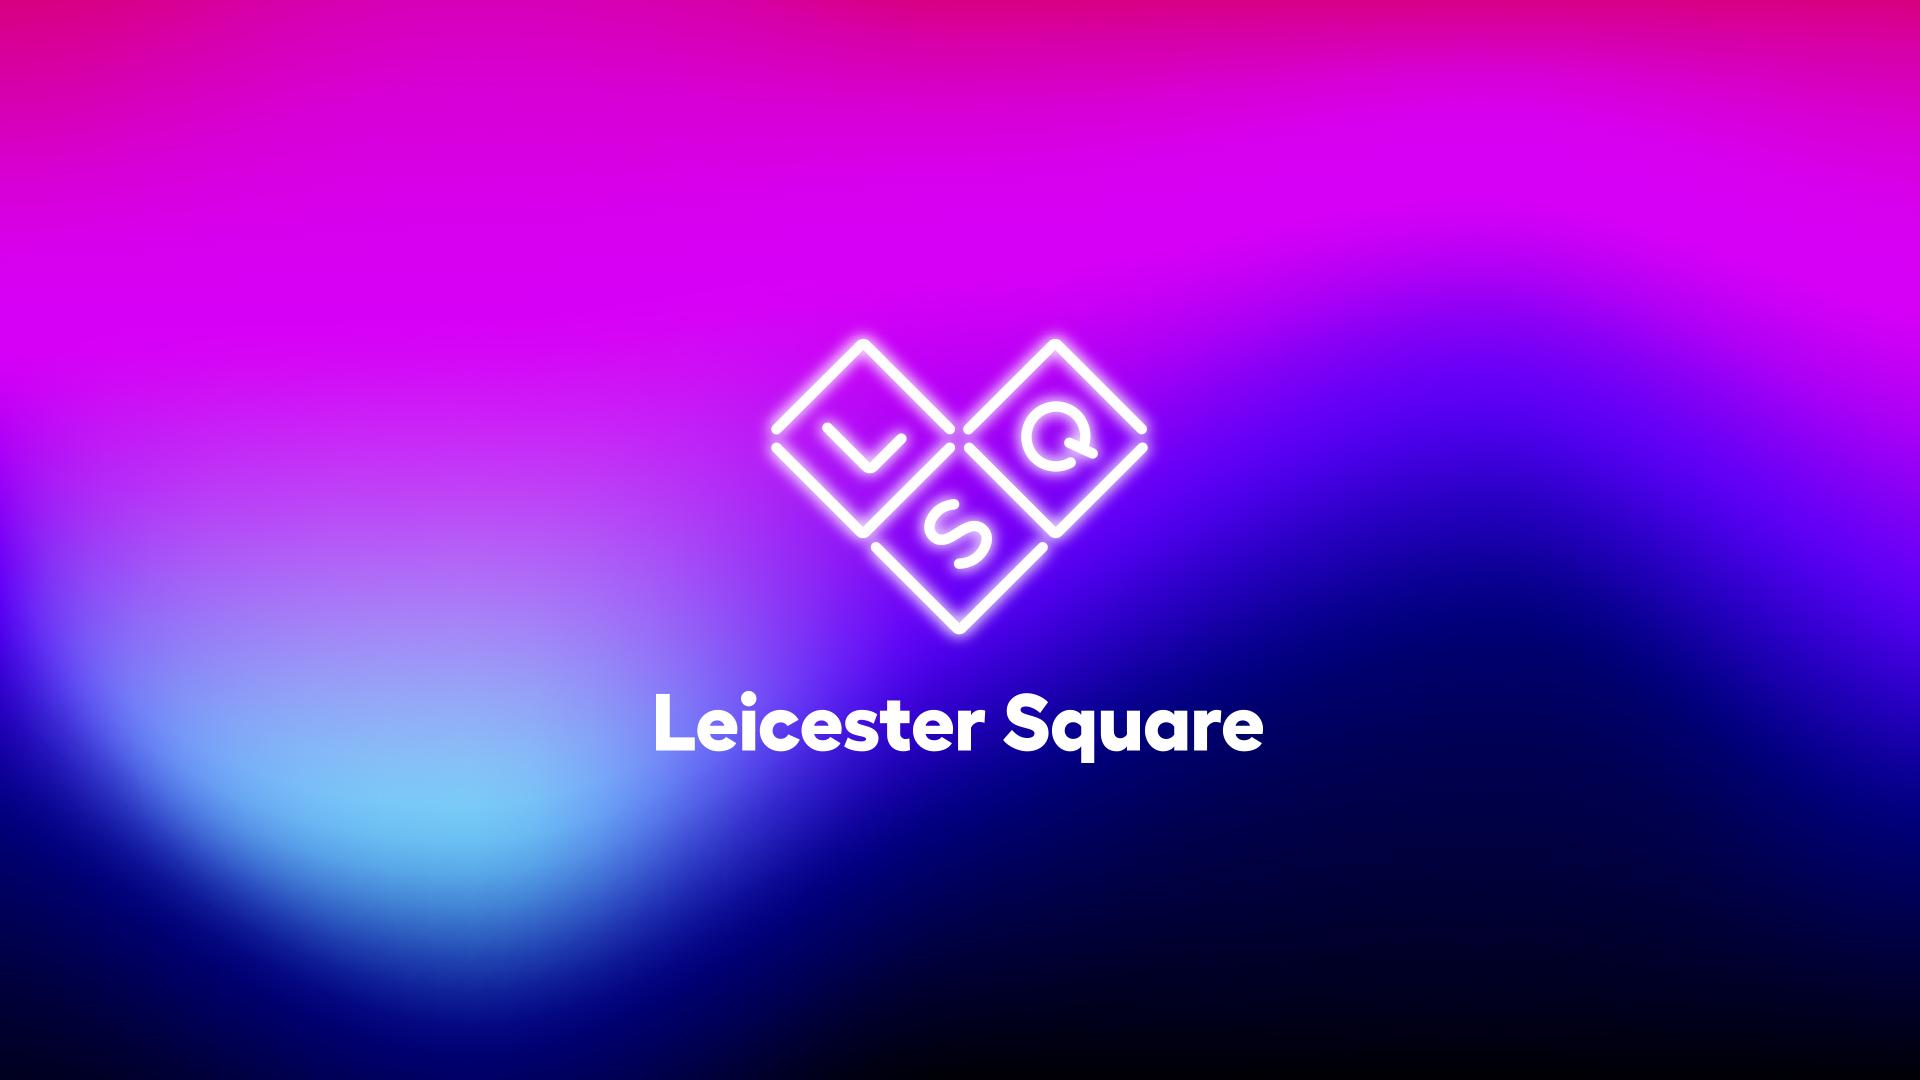 Lantern_LeicesterSquare_1.jpg